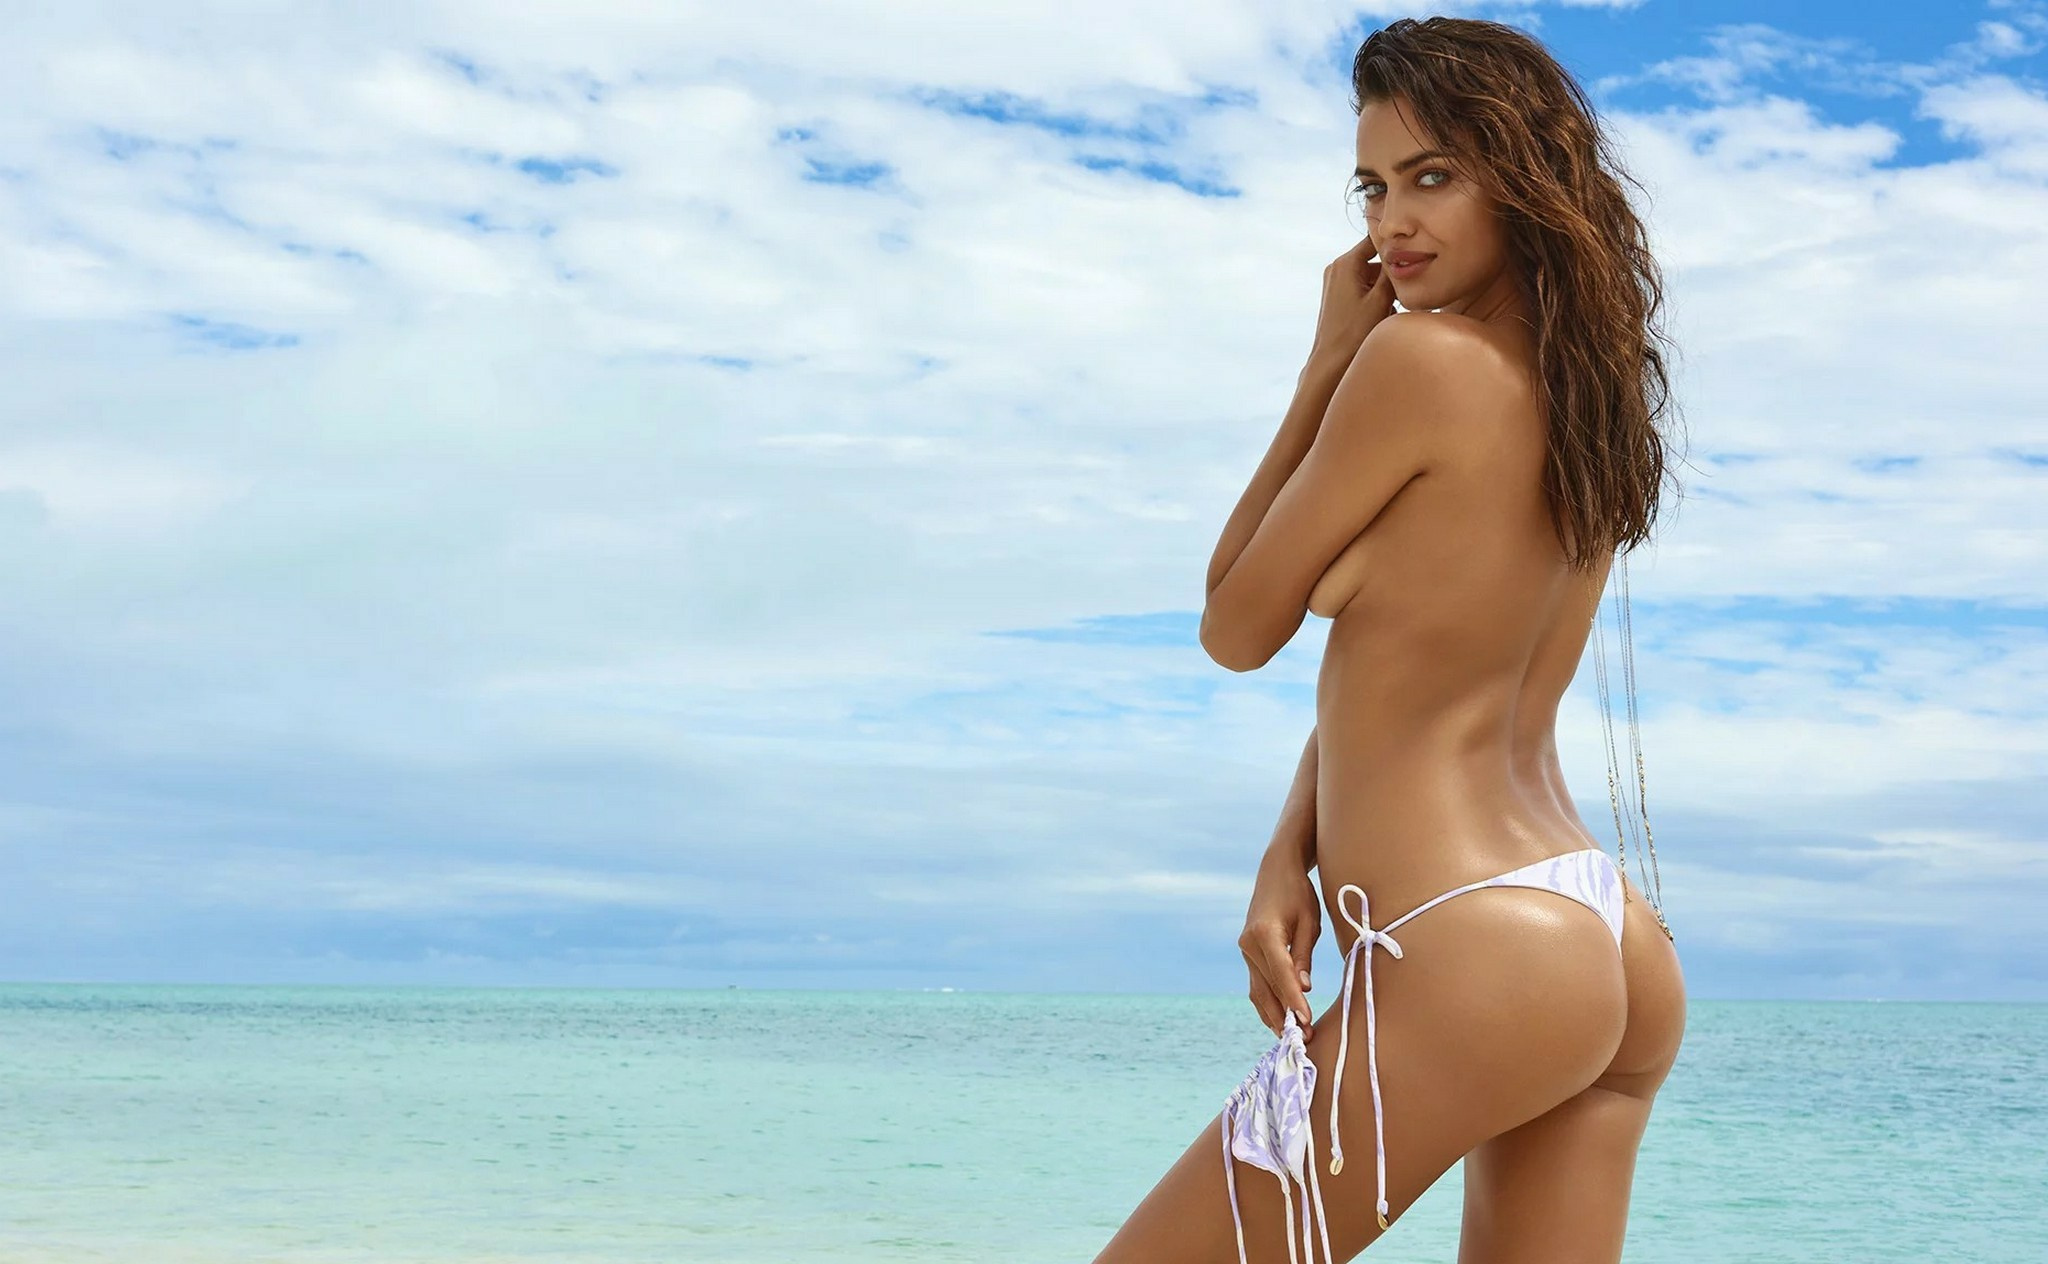 Irina Shayk Nude Photos